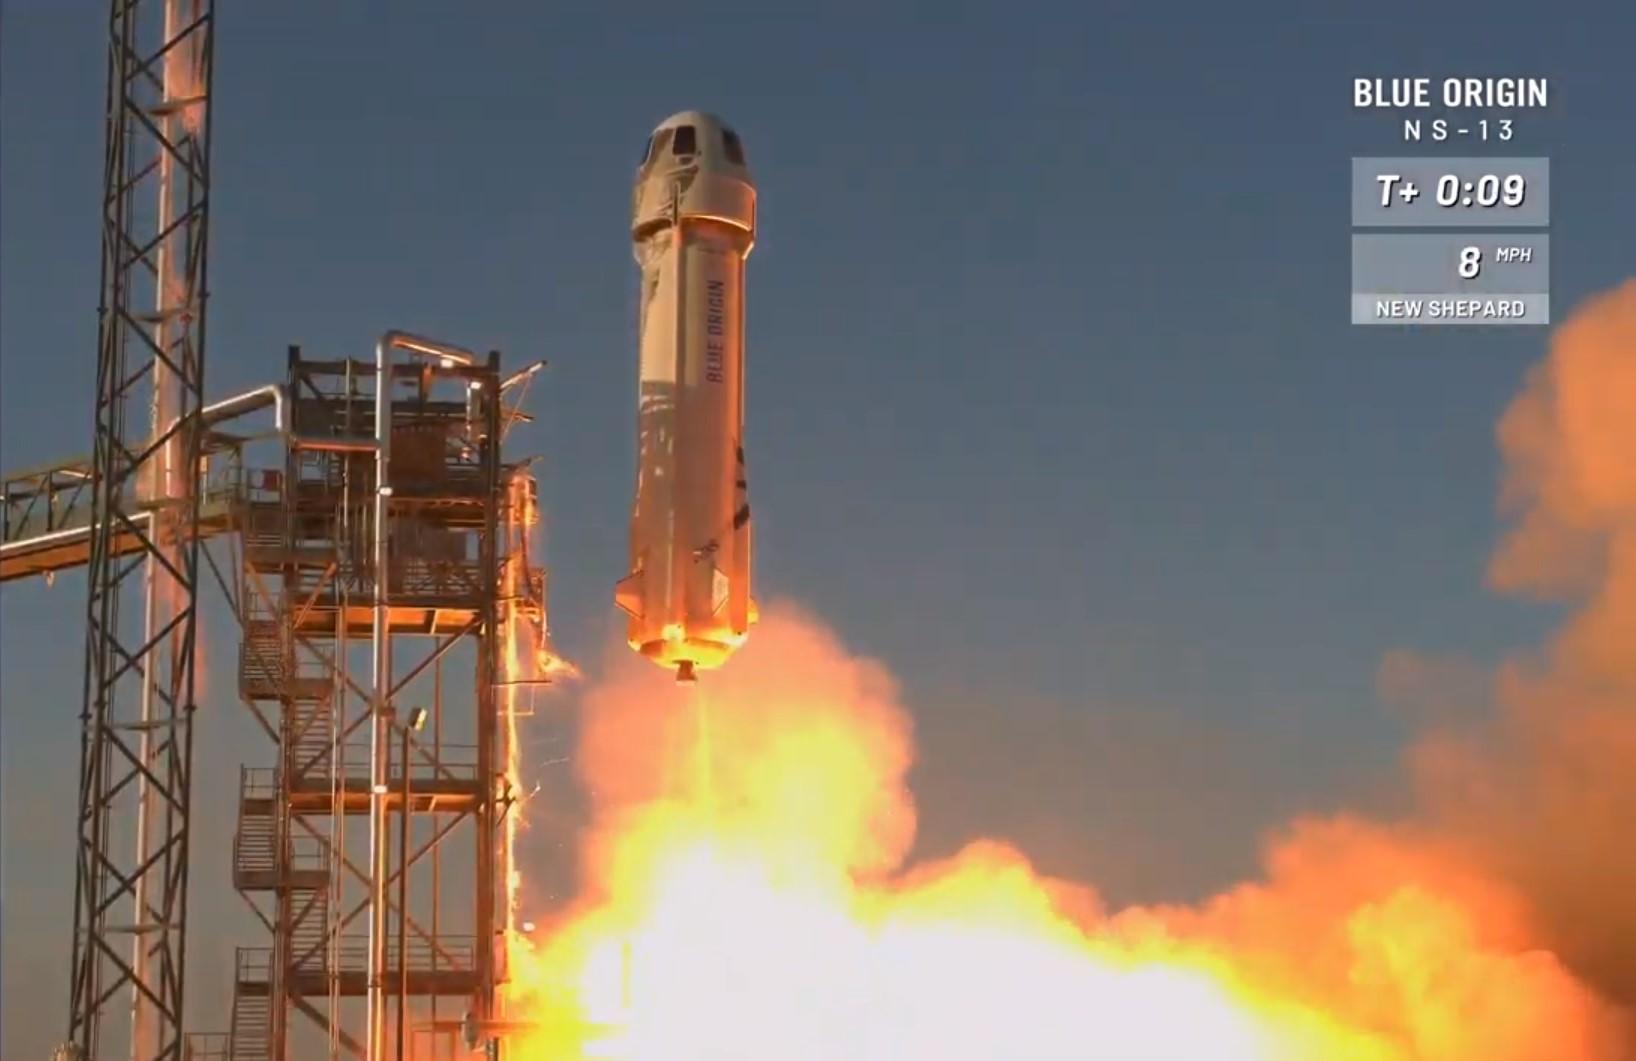 Blue Origin's suborbital spaceship tests NASA's moon landing system in Texas